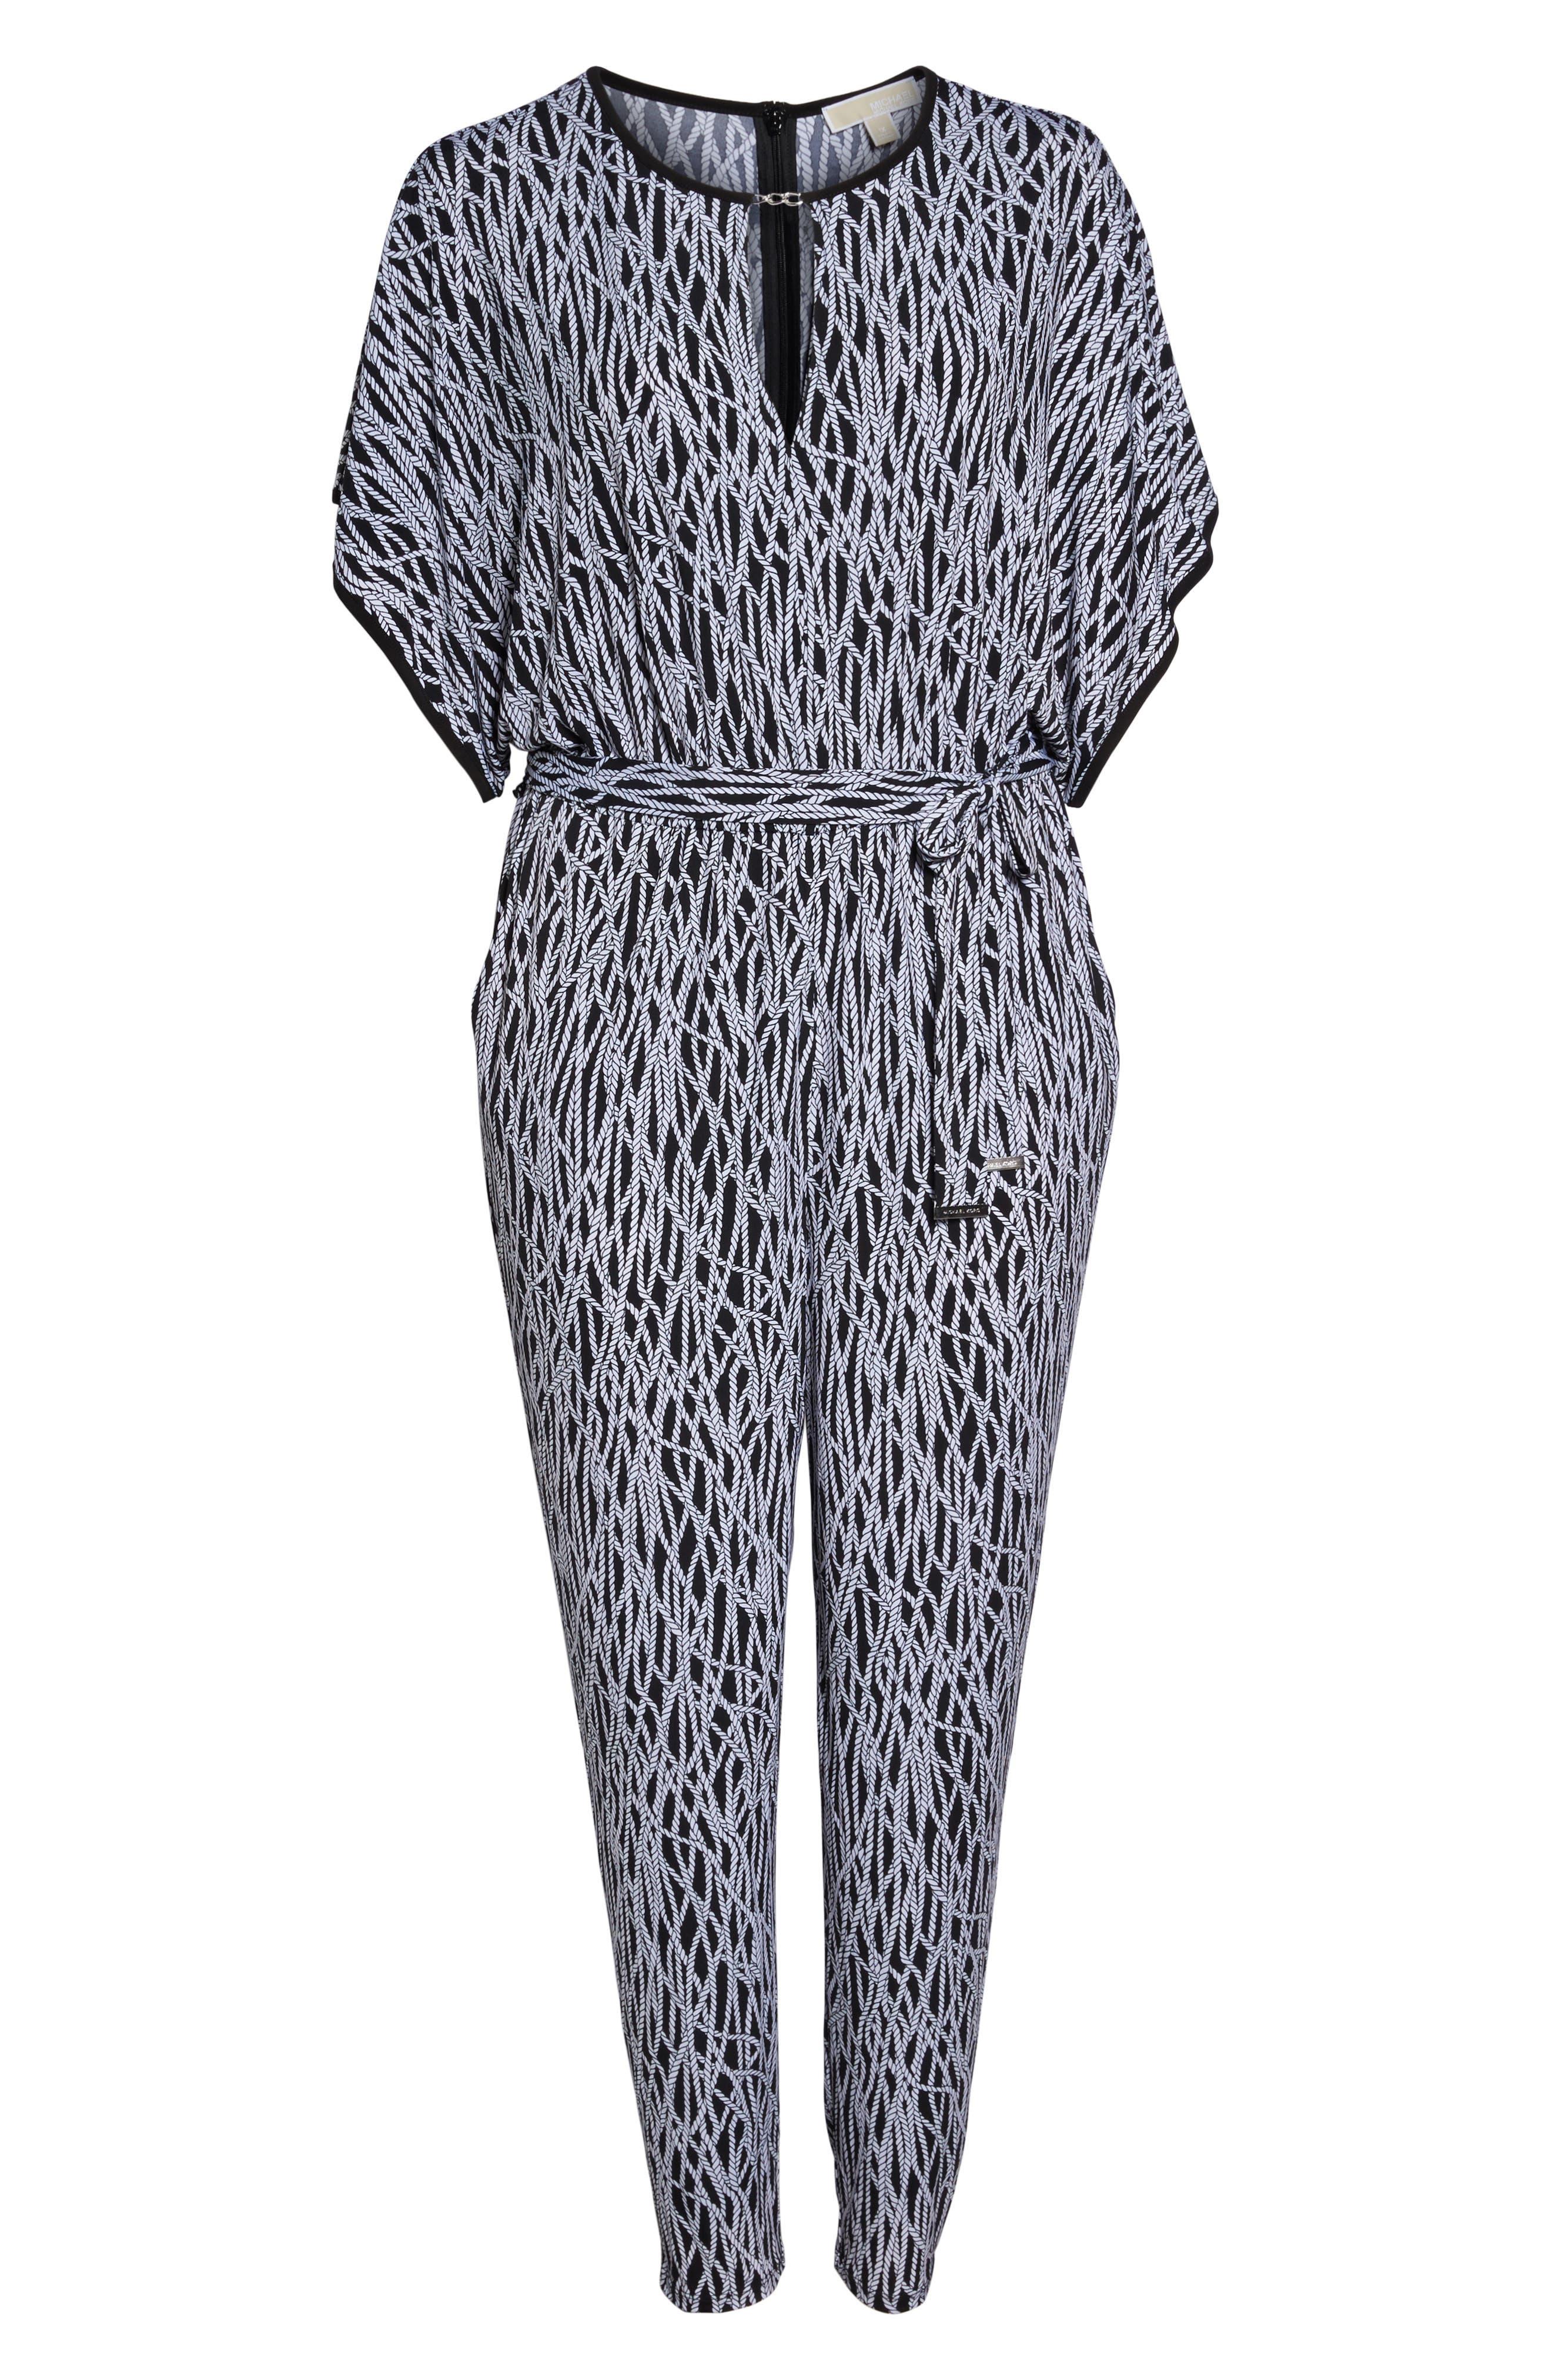 Chained Keyhole Neck Jumpsuit,                             Alternate thumbnail 6, color,                             Black/ White